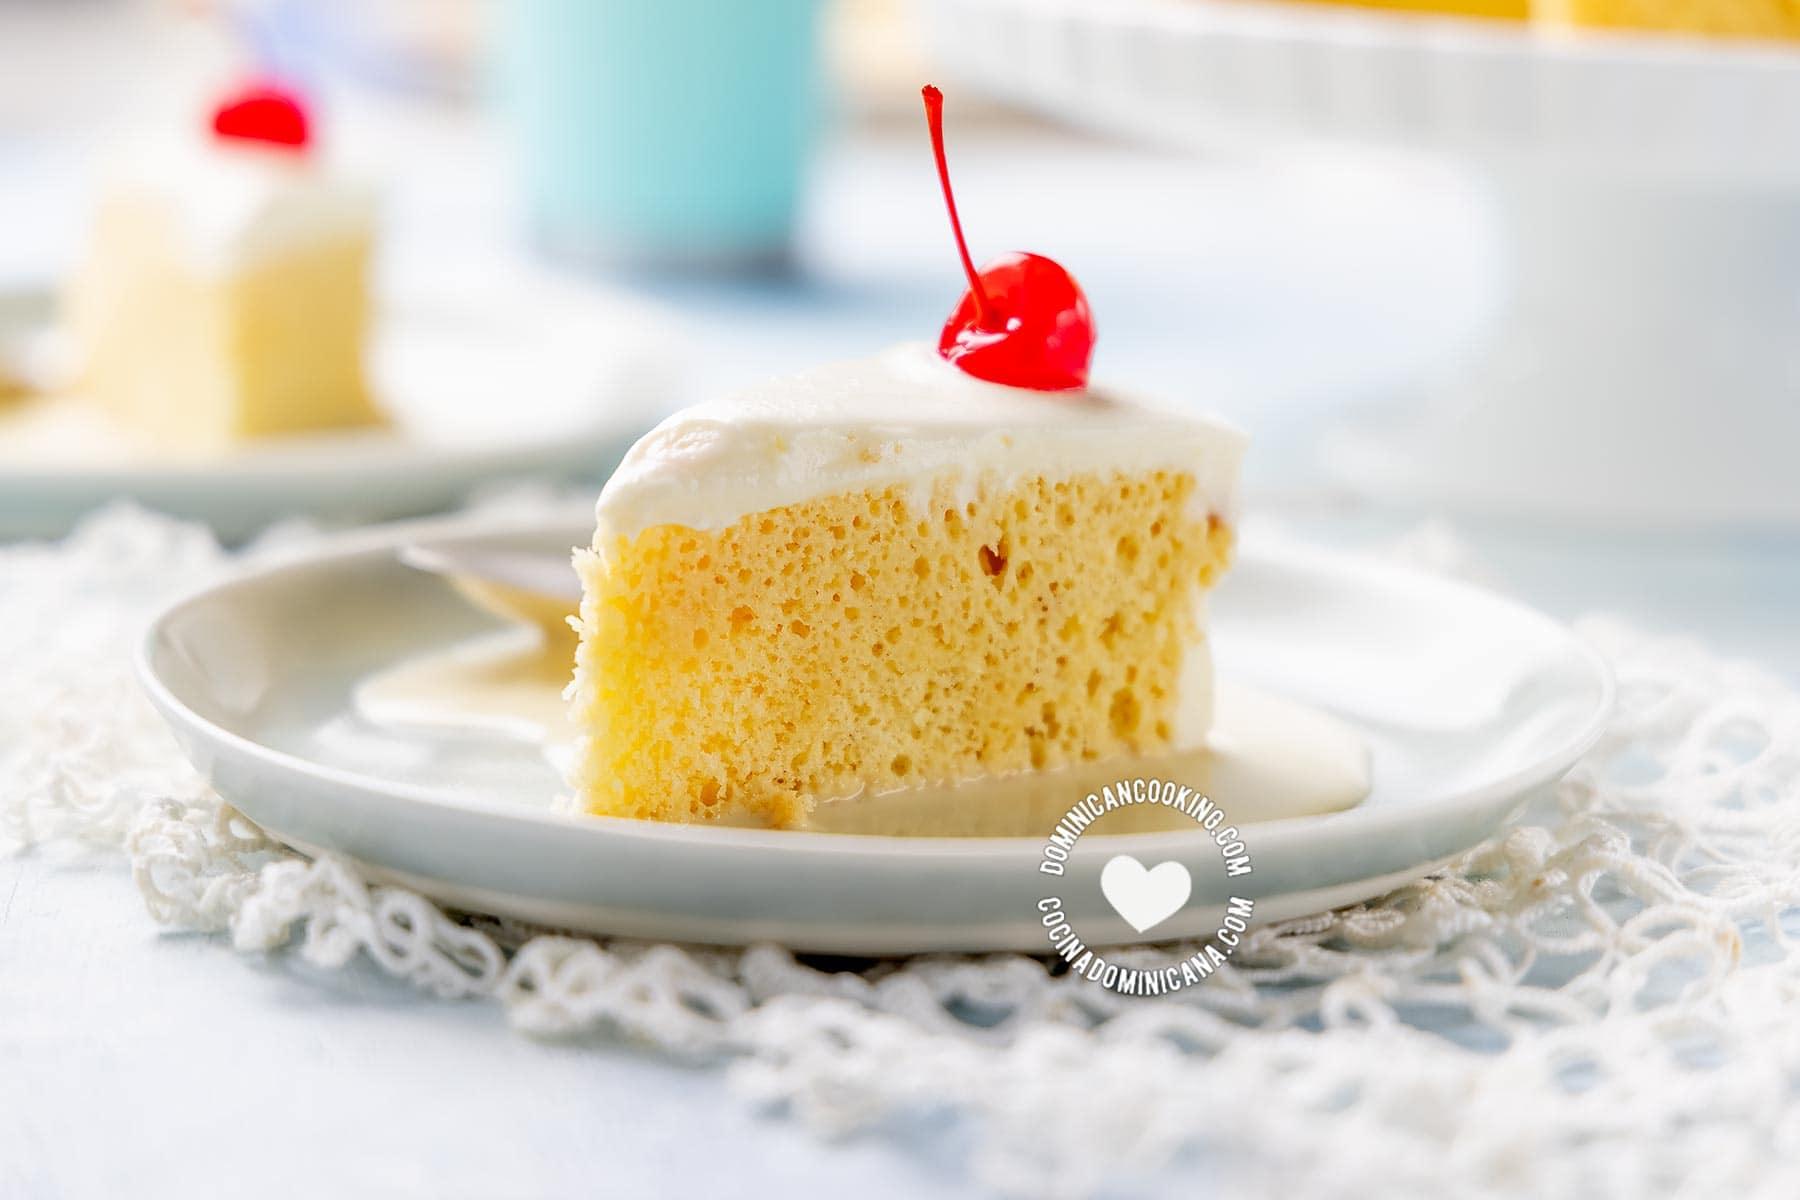 Slices of Tres Leches (Three-Milk Cake)